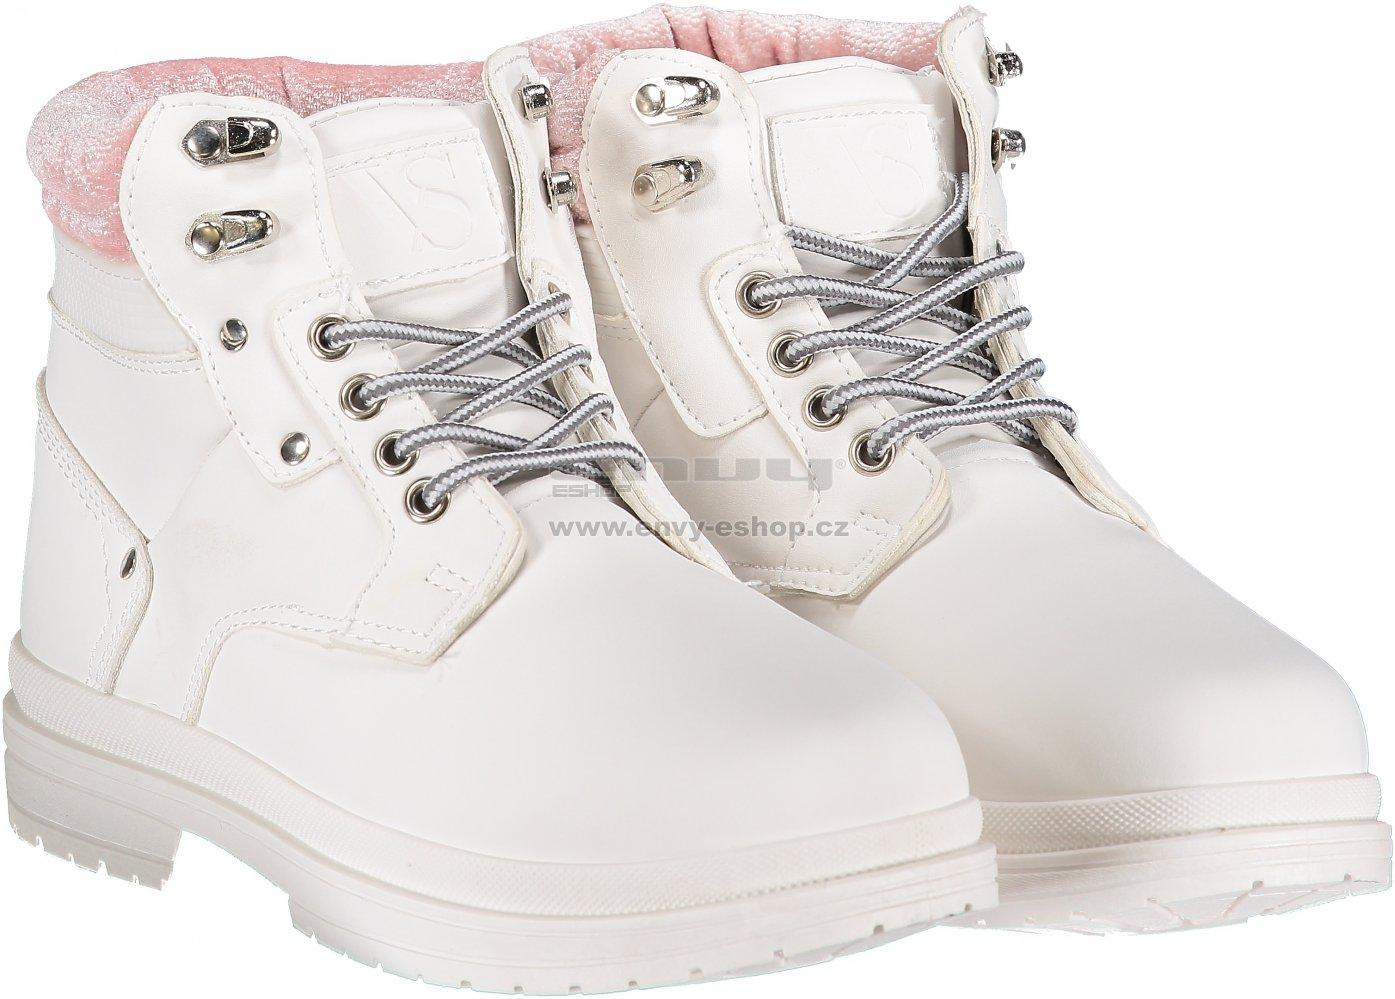 3fdd37b3930 Dámské boty VICES JB008-41 WHITE velikost  37   ENVY-ESHOP.cz